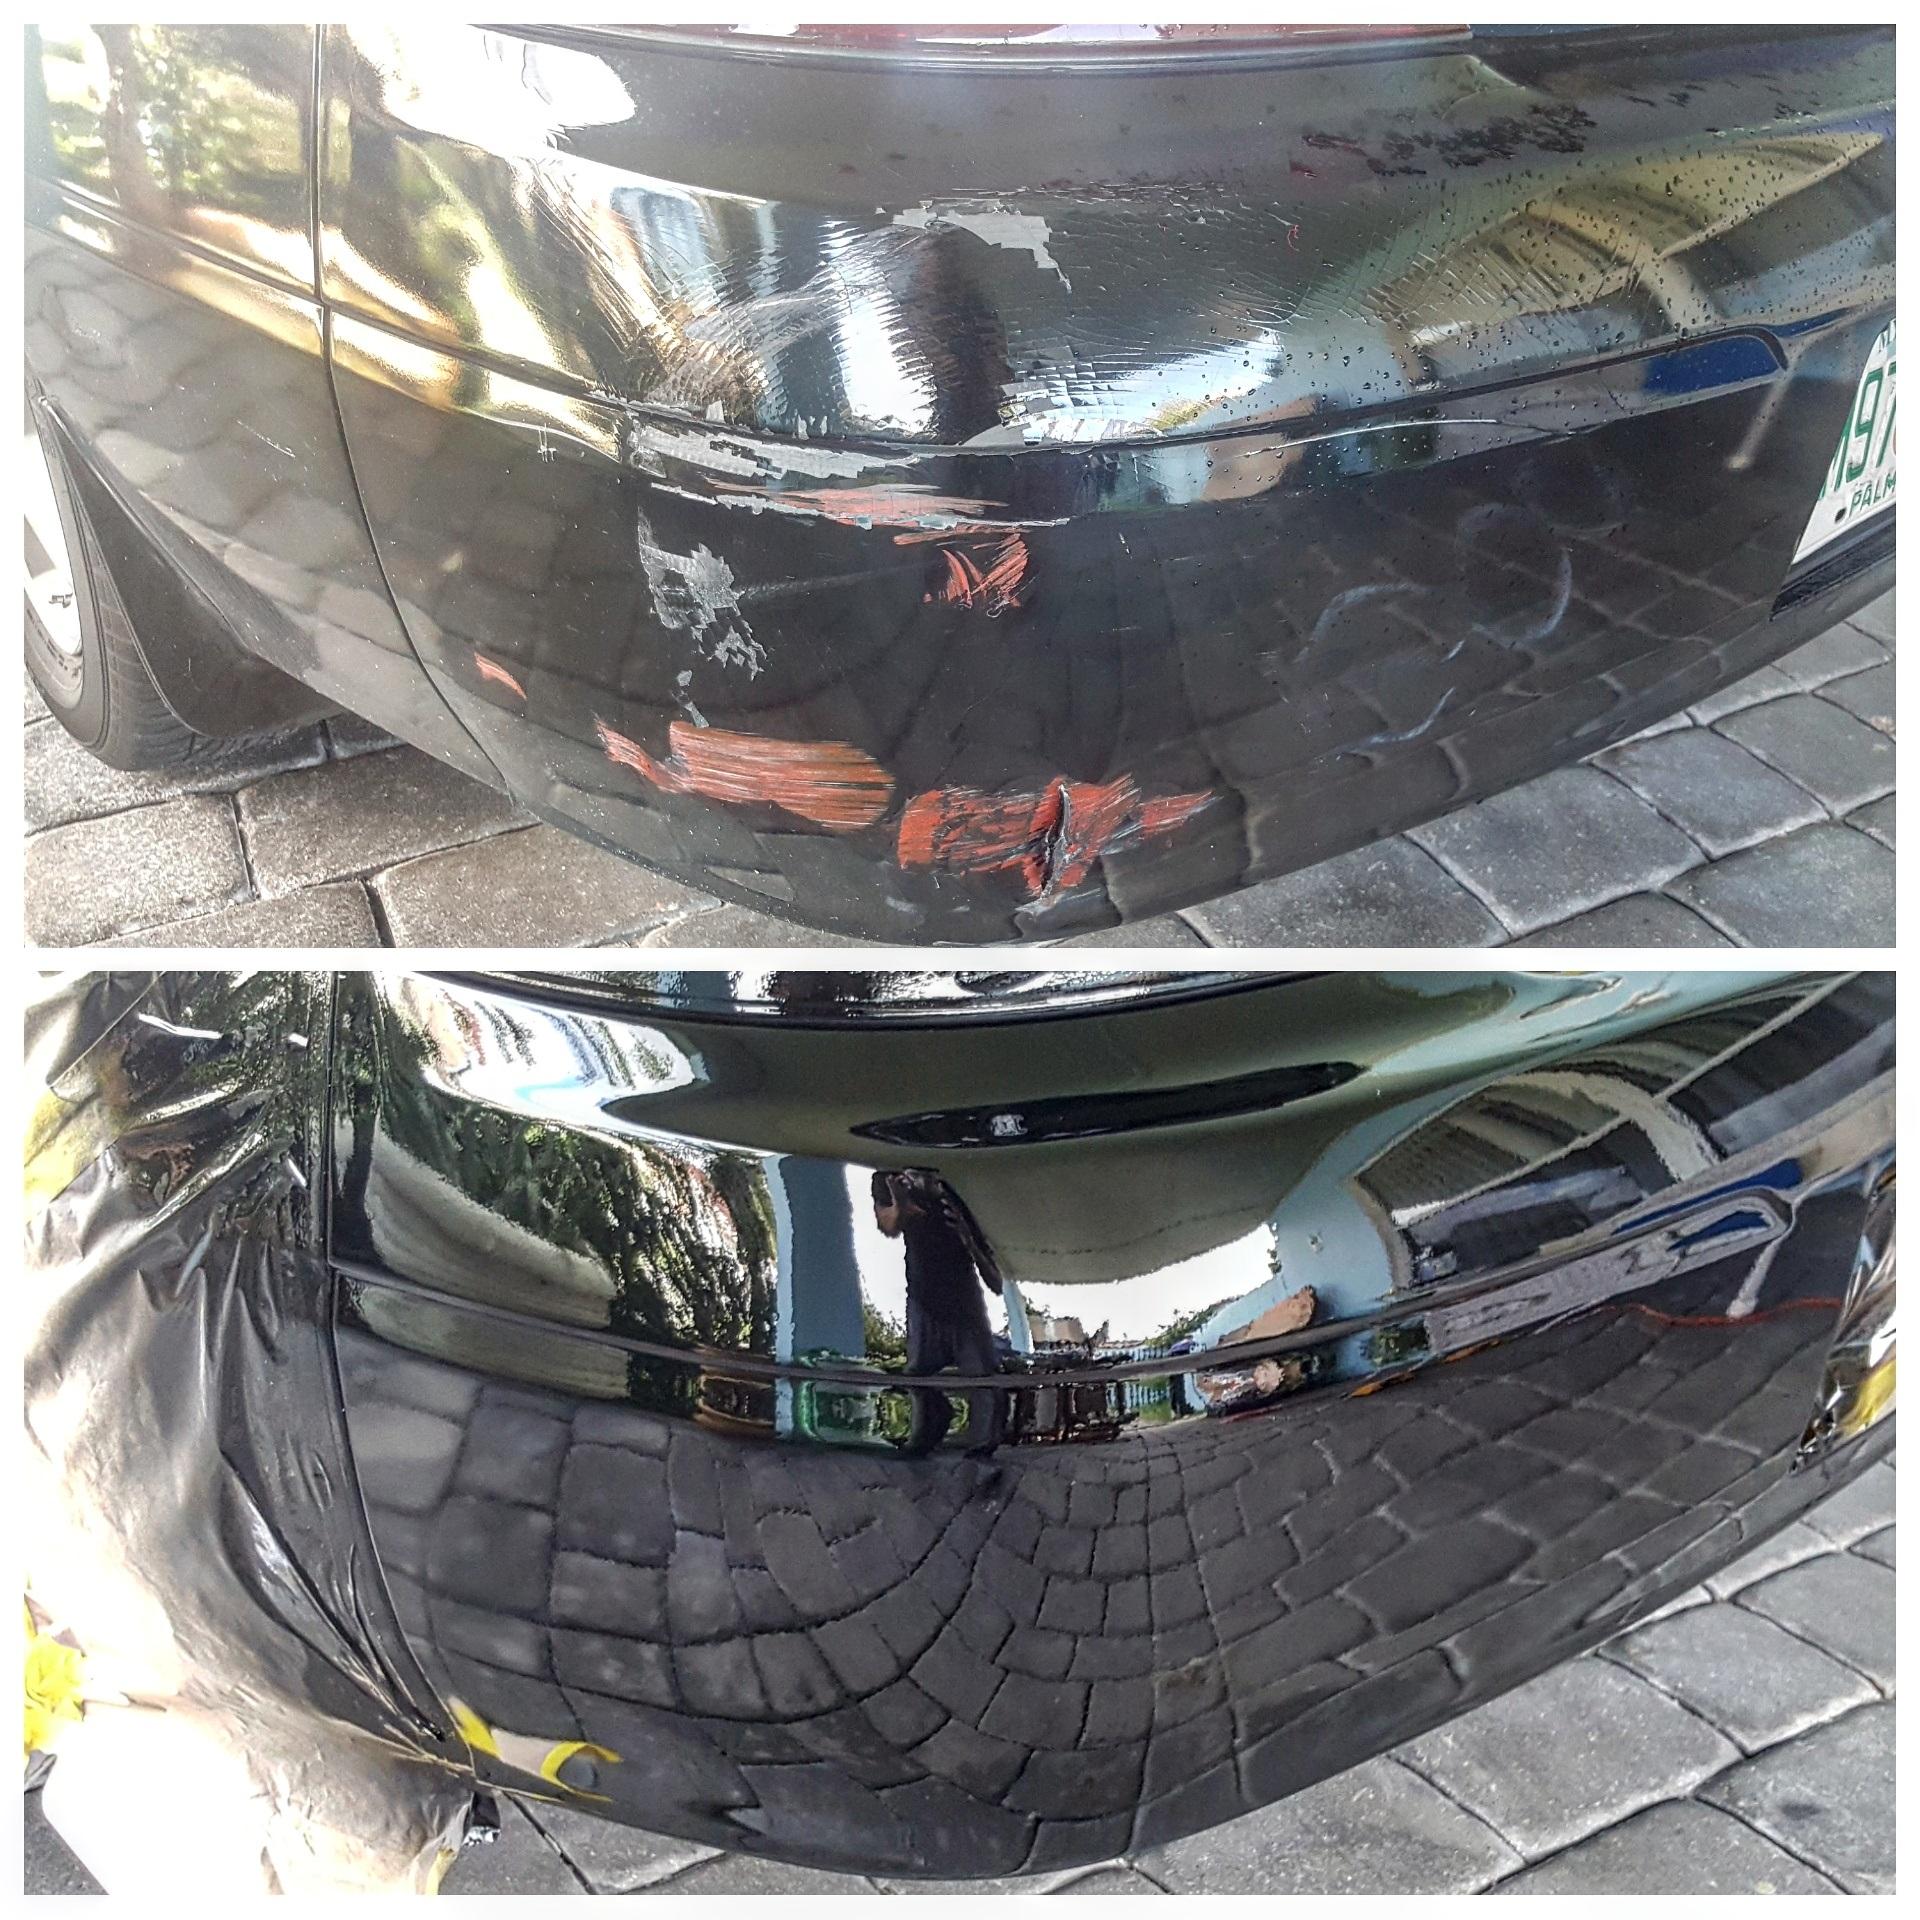 mobile autobody repair service Boca Raton fl